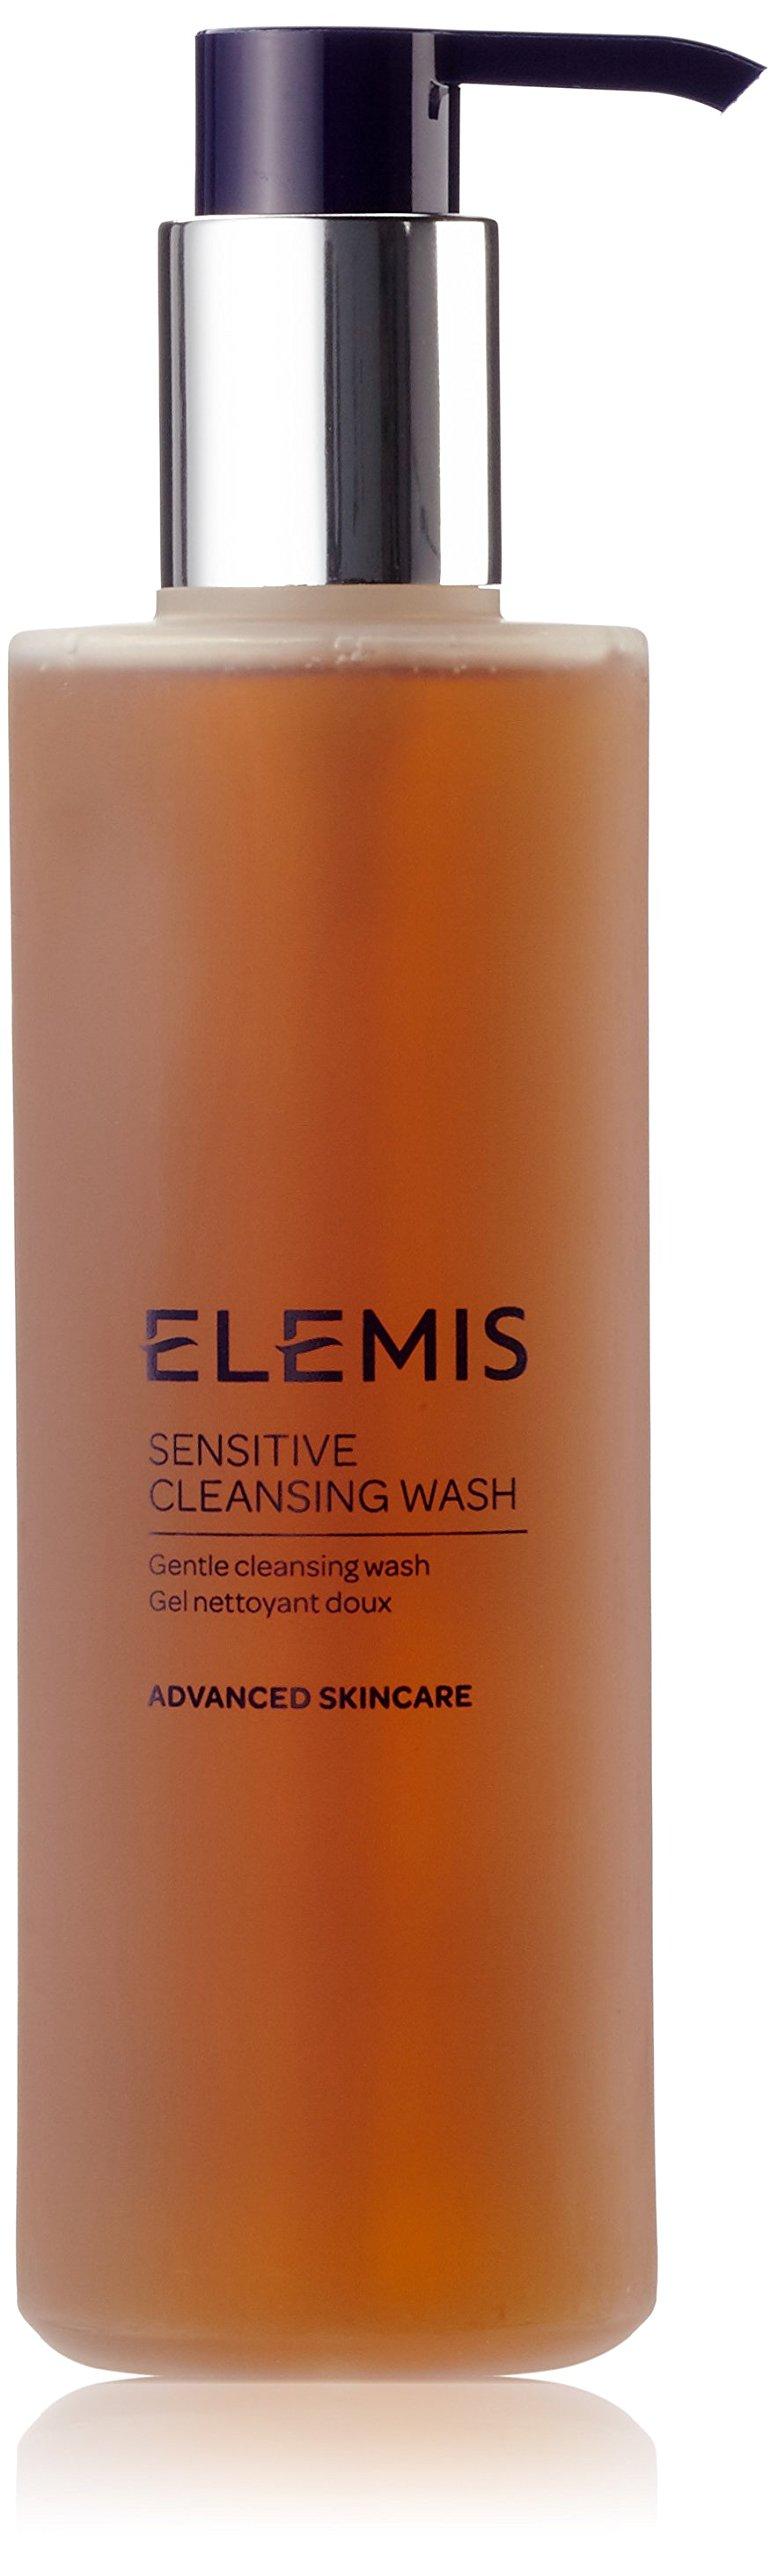 Elemis Sensitive Cleansing Wash Skin Care 200ml / 7 fl.oz.